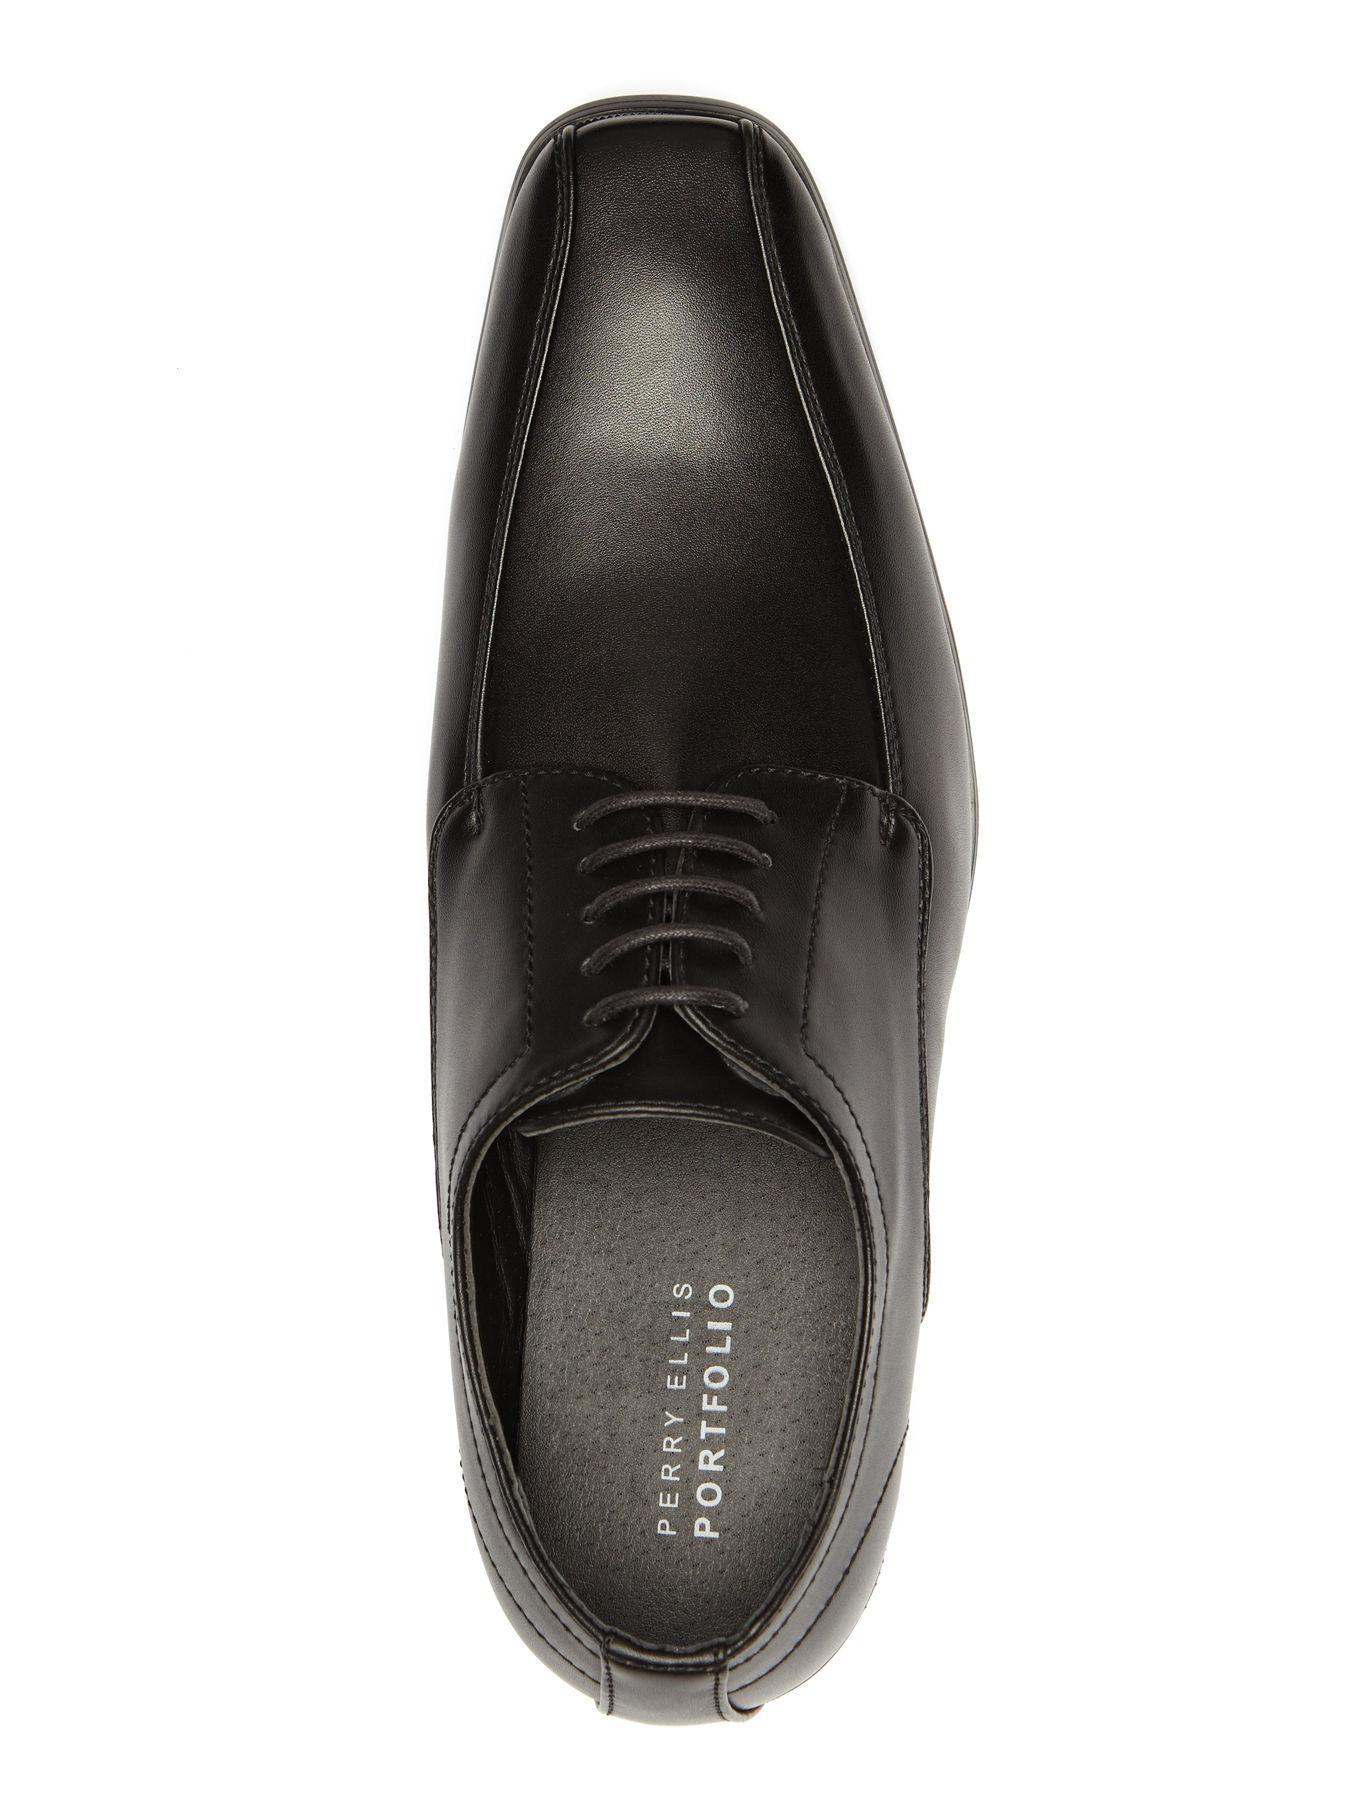 4939e1e1d6 Lyst - Perry Ellis Stanley Dress Shoe in Black for Men